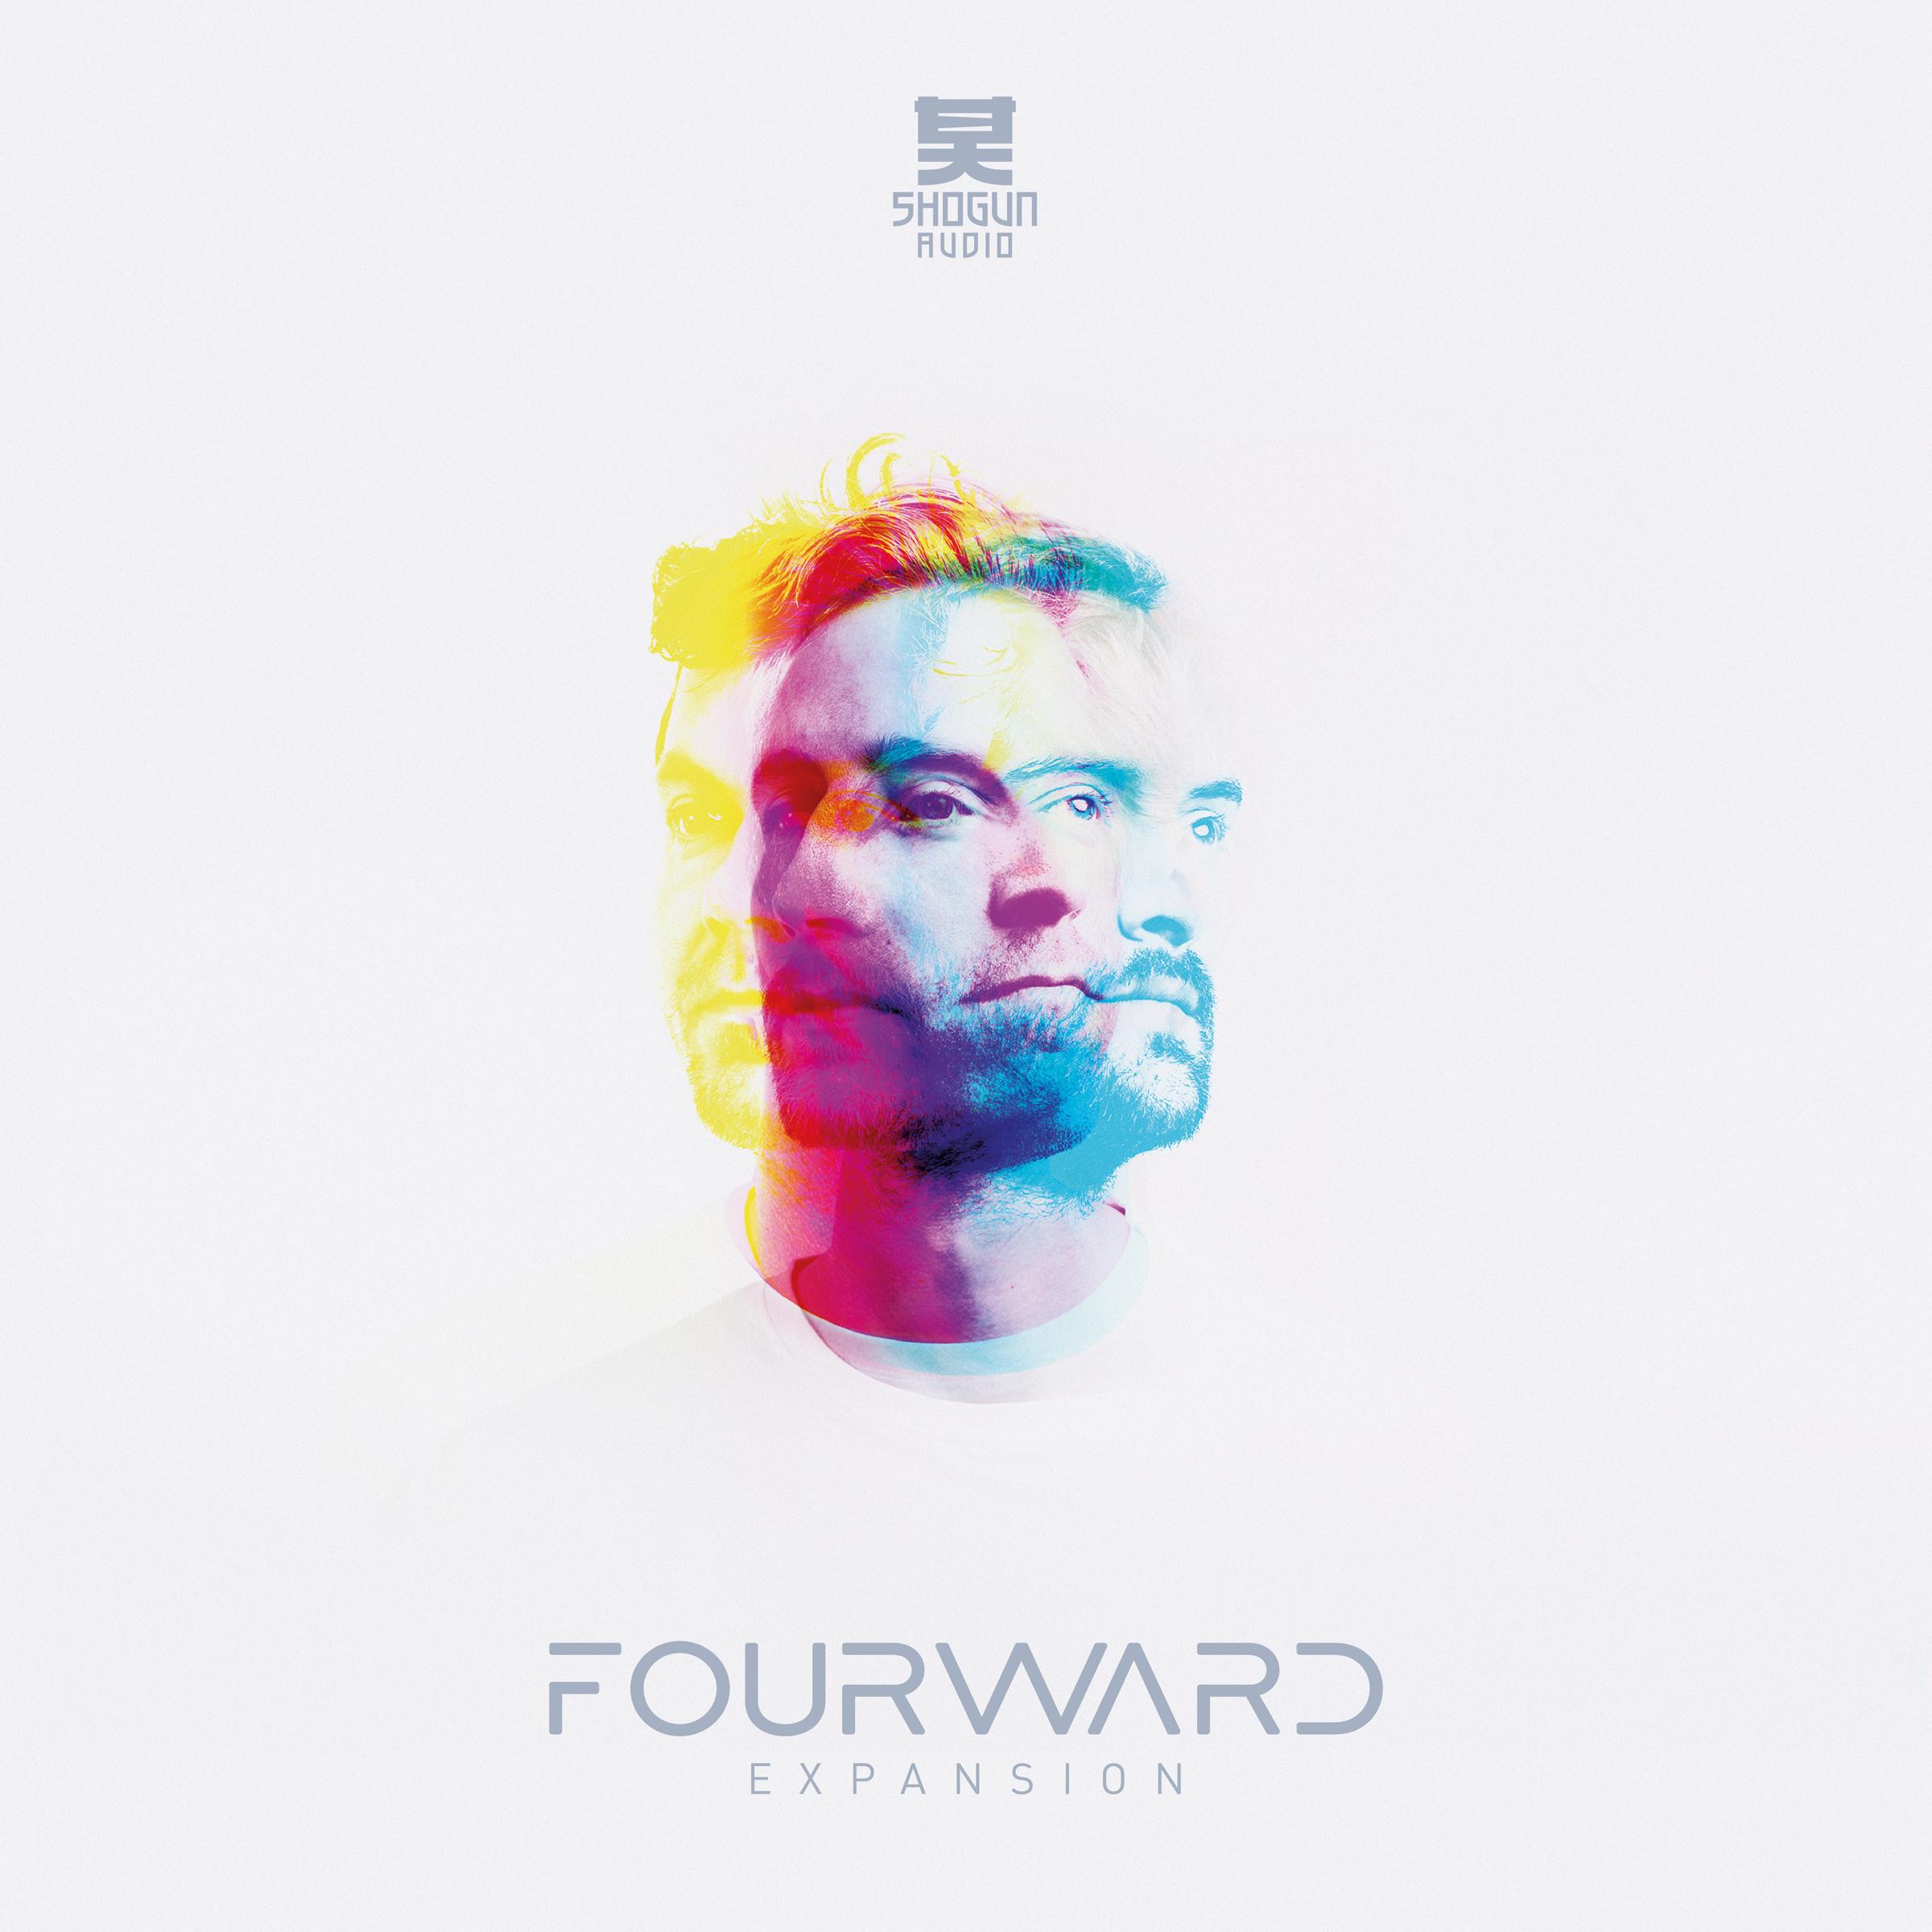 Fourward/EXPANSION DLP